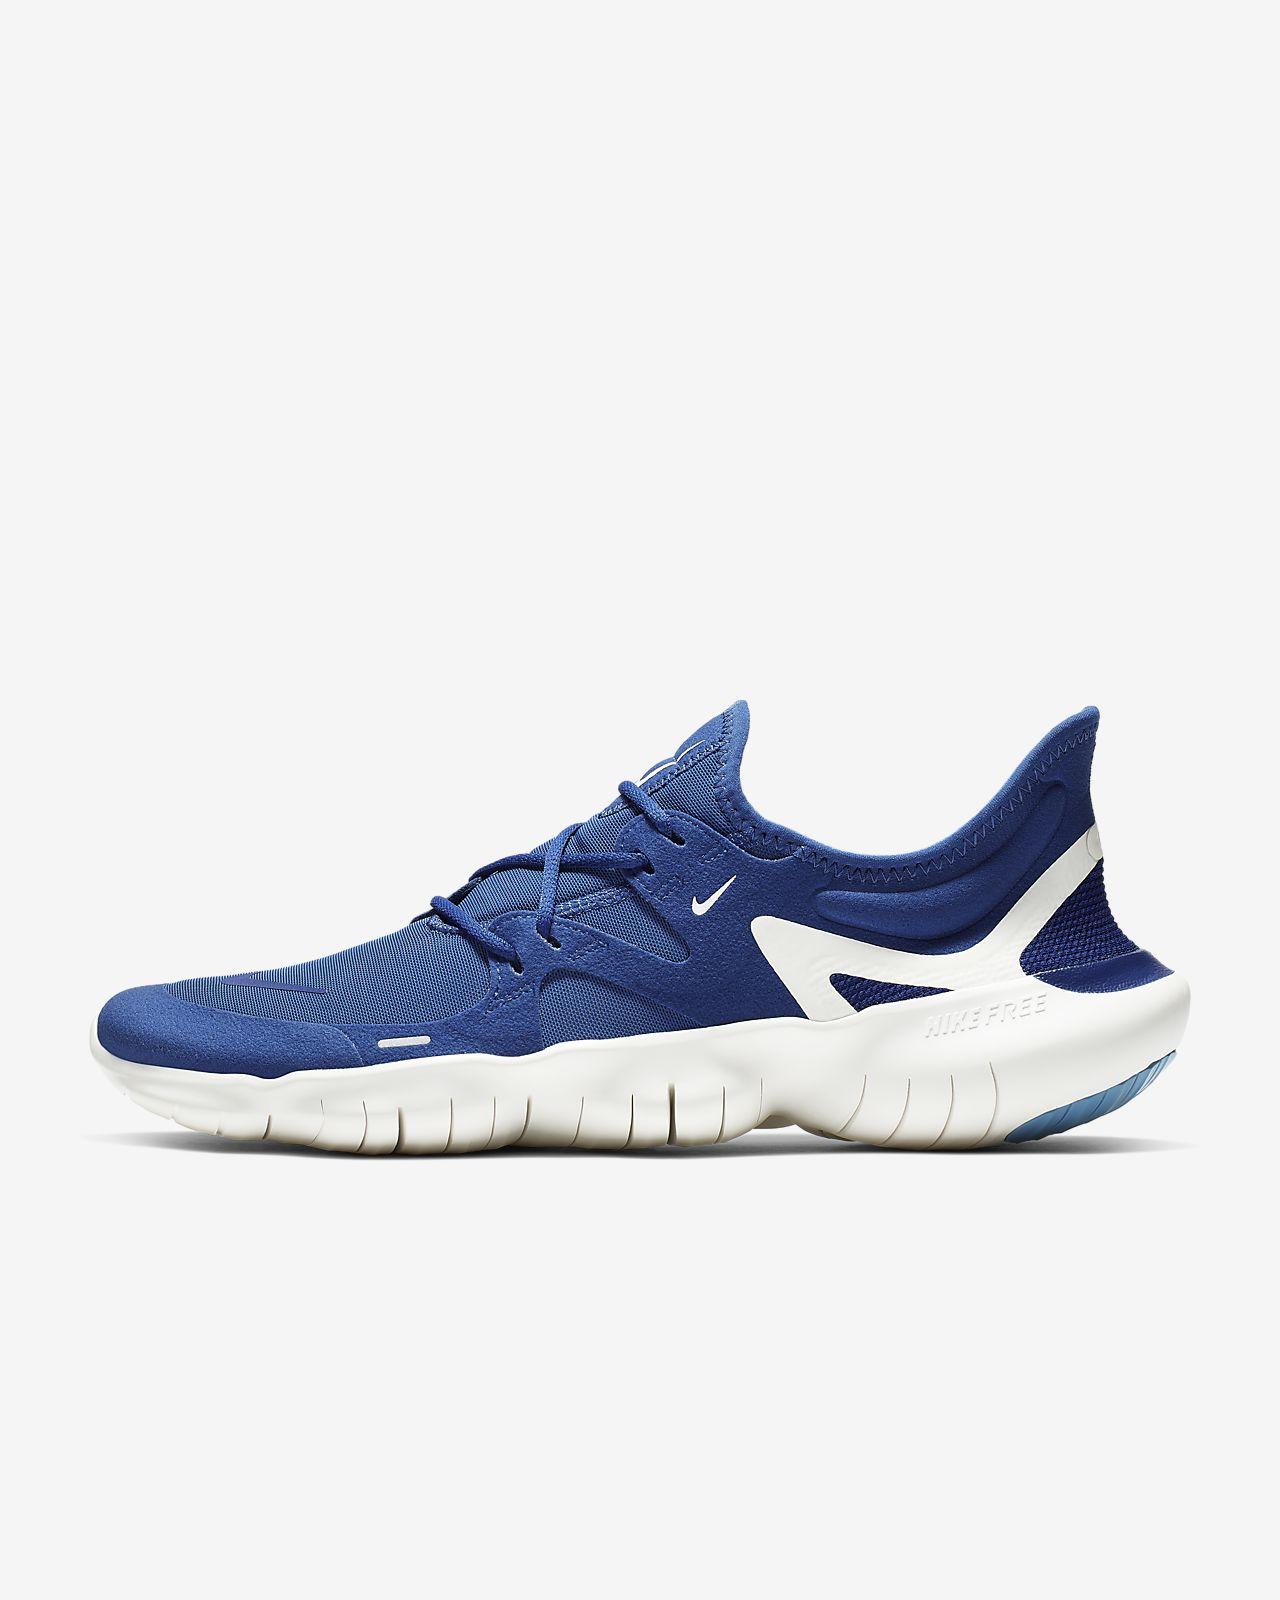 Nike Free RN 5.0 男子跑步鞋